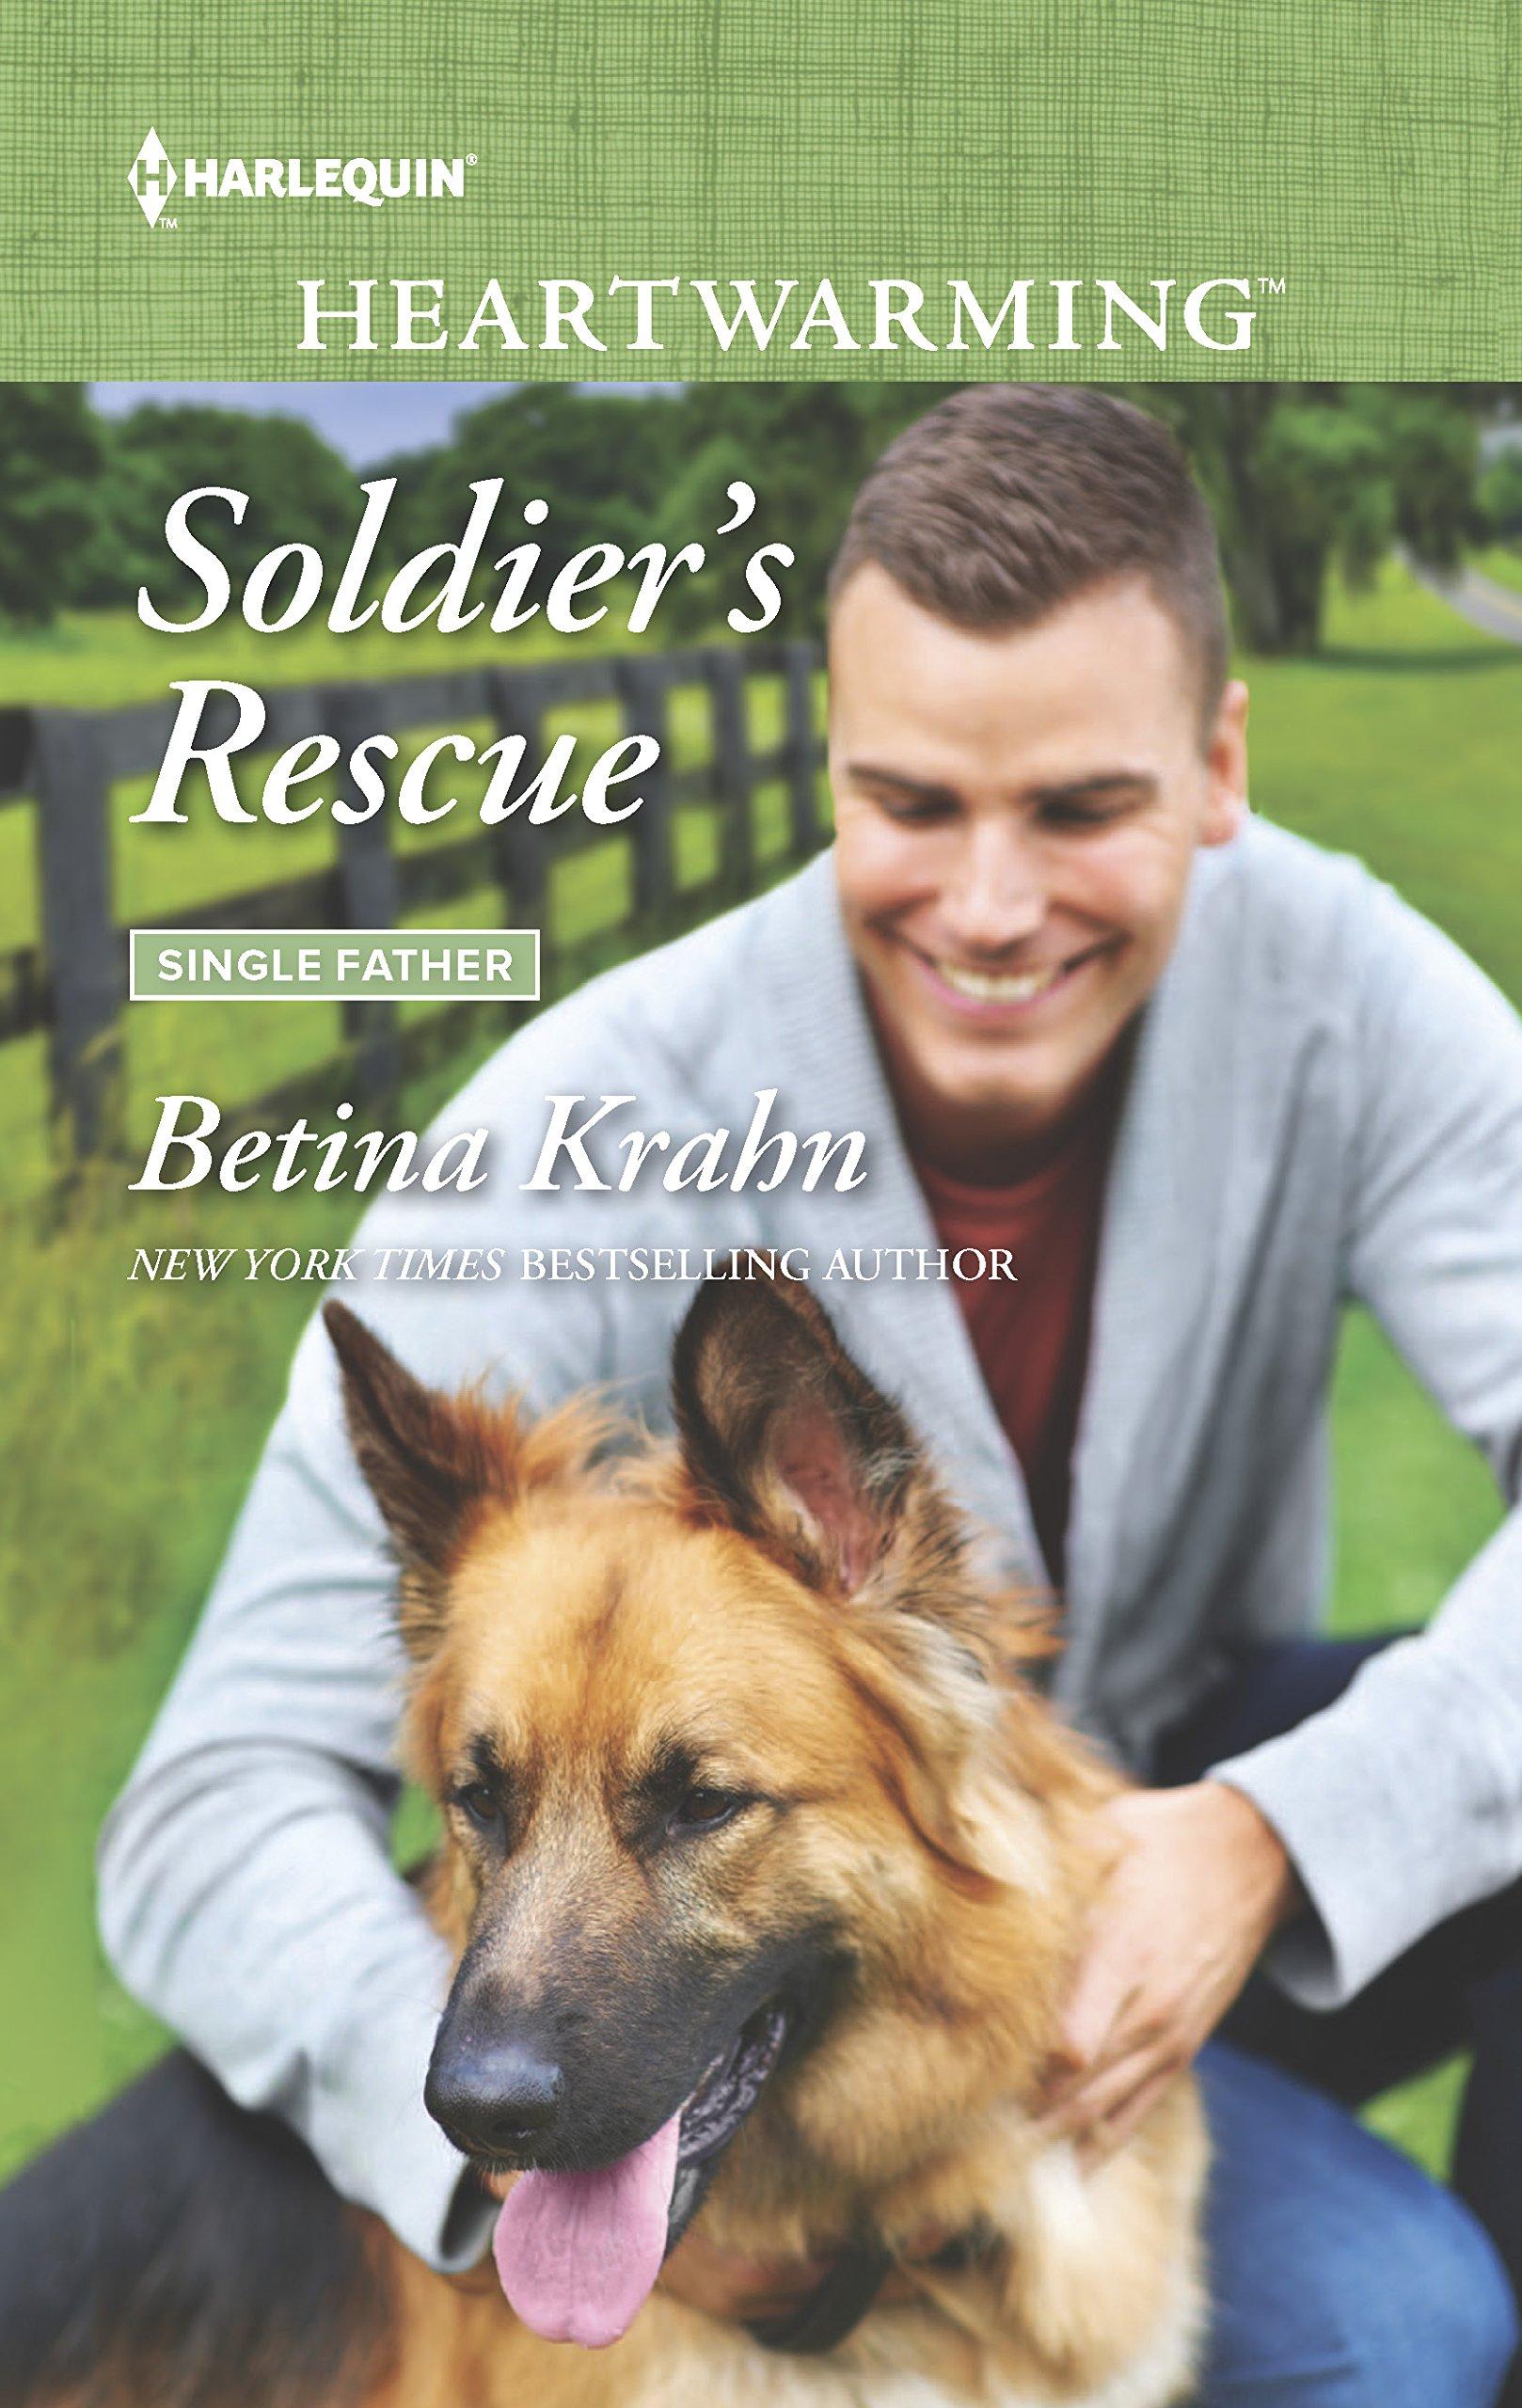 Soldier's Rescue (Single Father) ebook